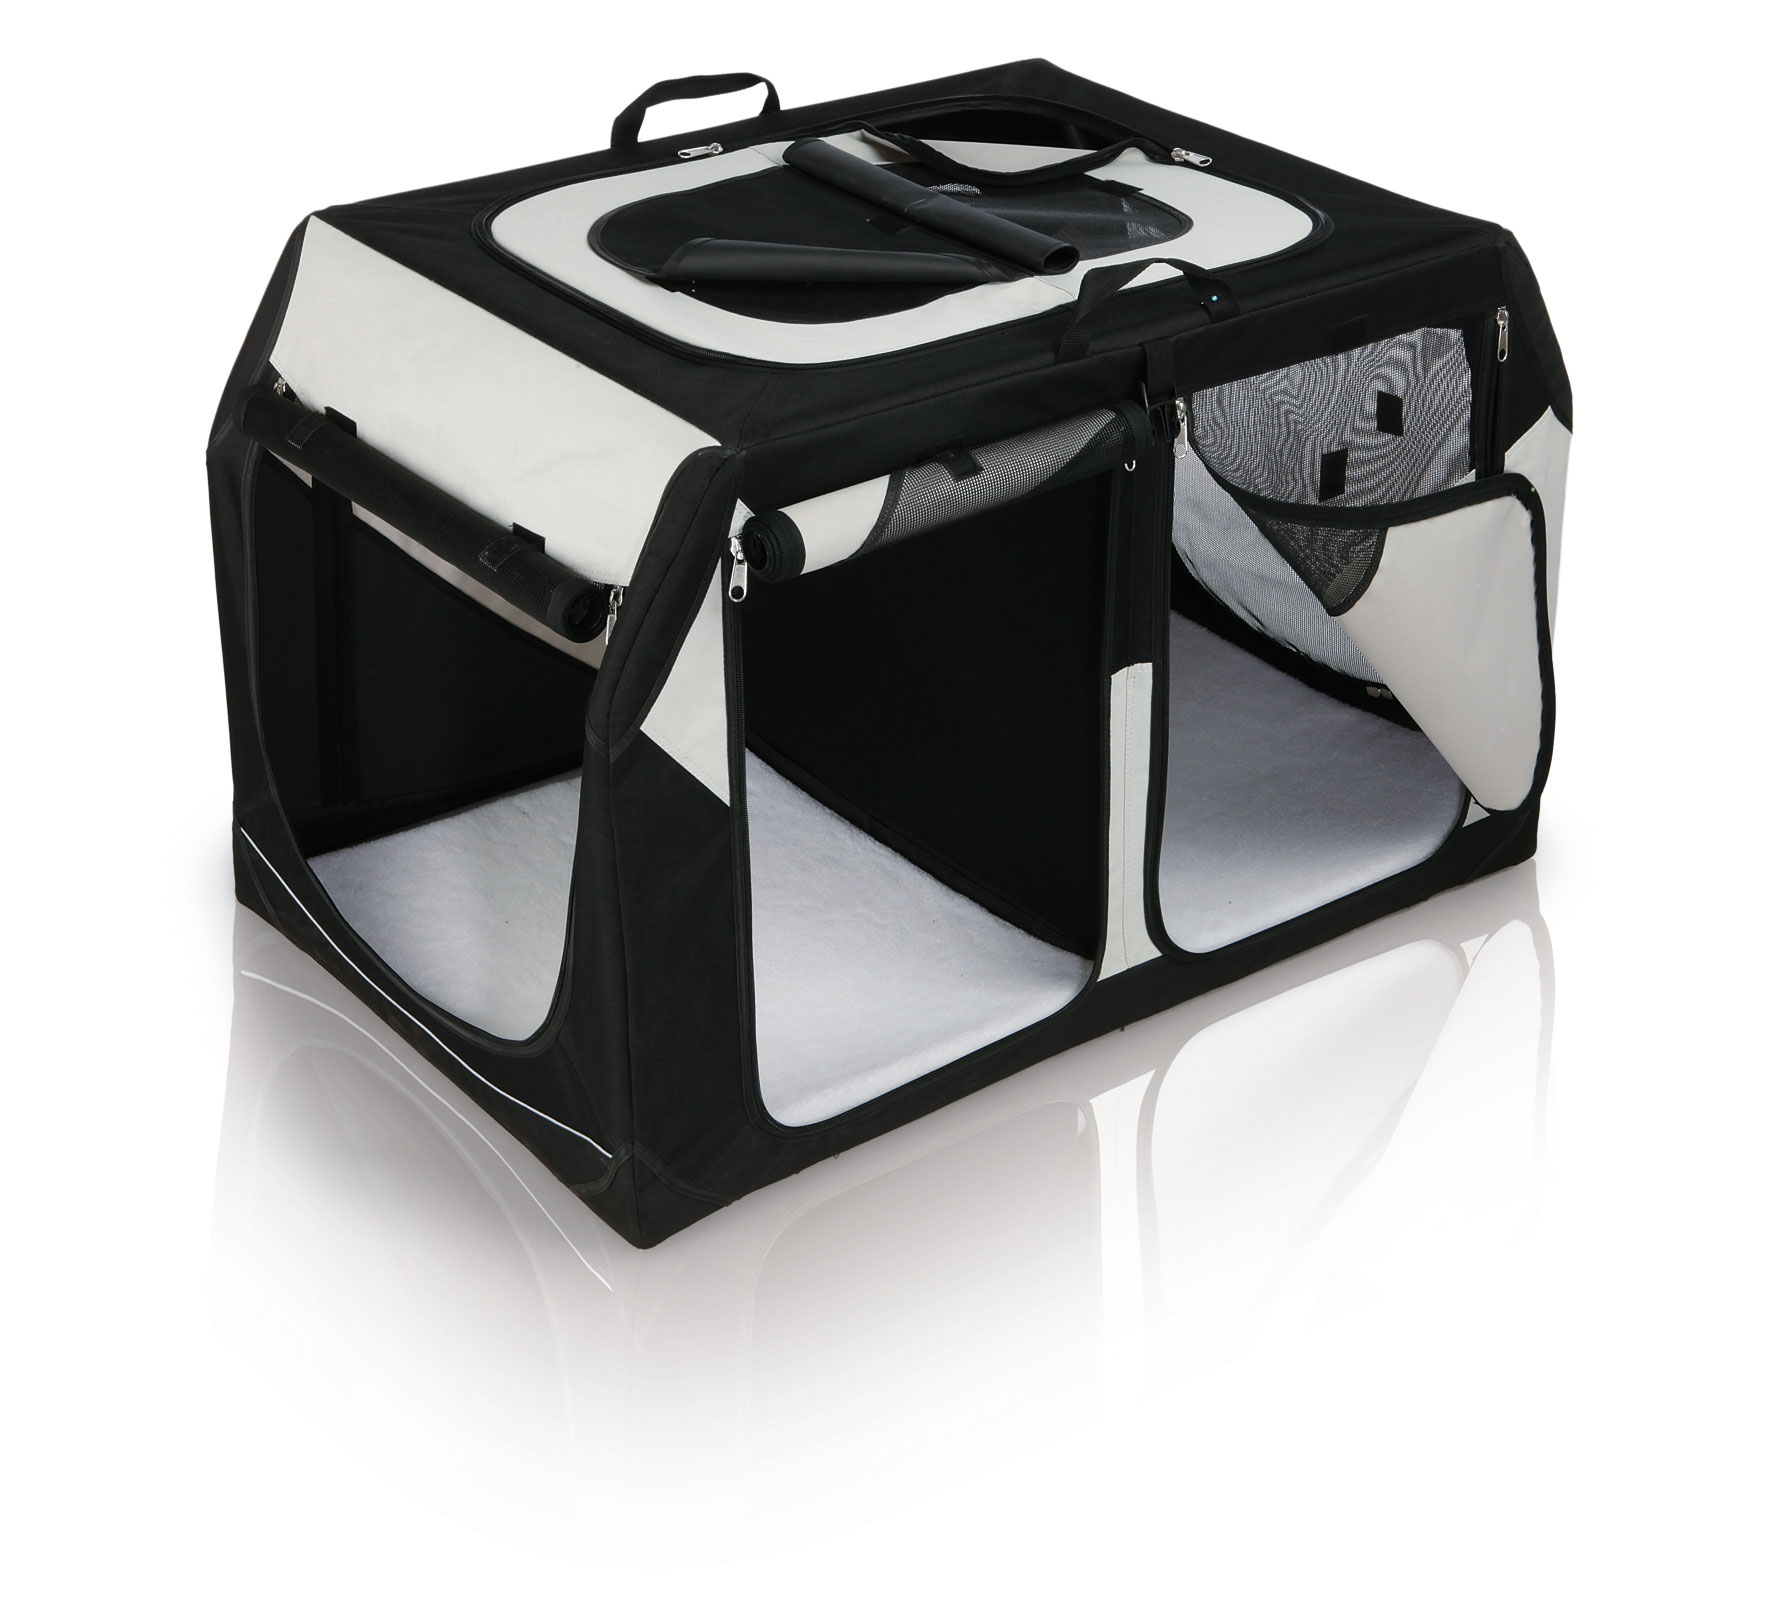 Transportbox Vario Double Gr. S-M TRIXIE schwarz/grau 91x60x61/57cm Bild 1